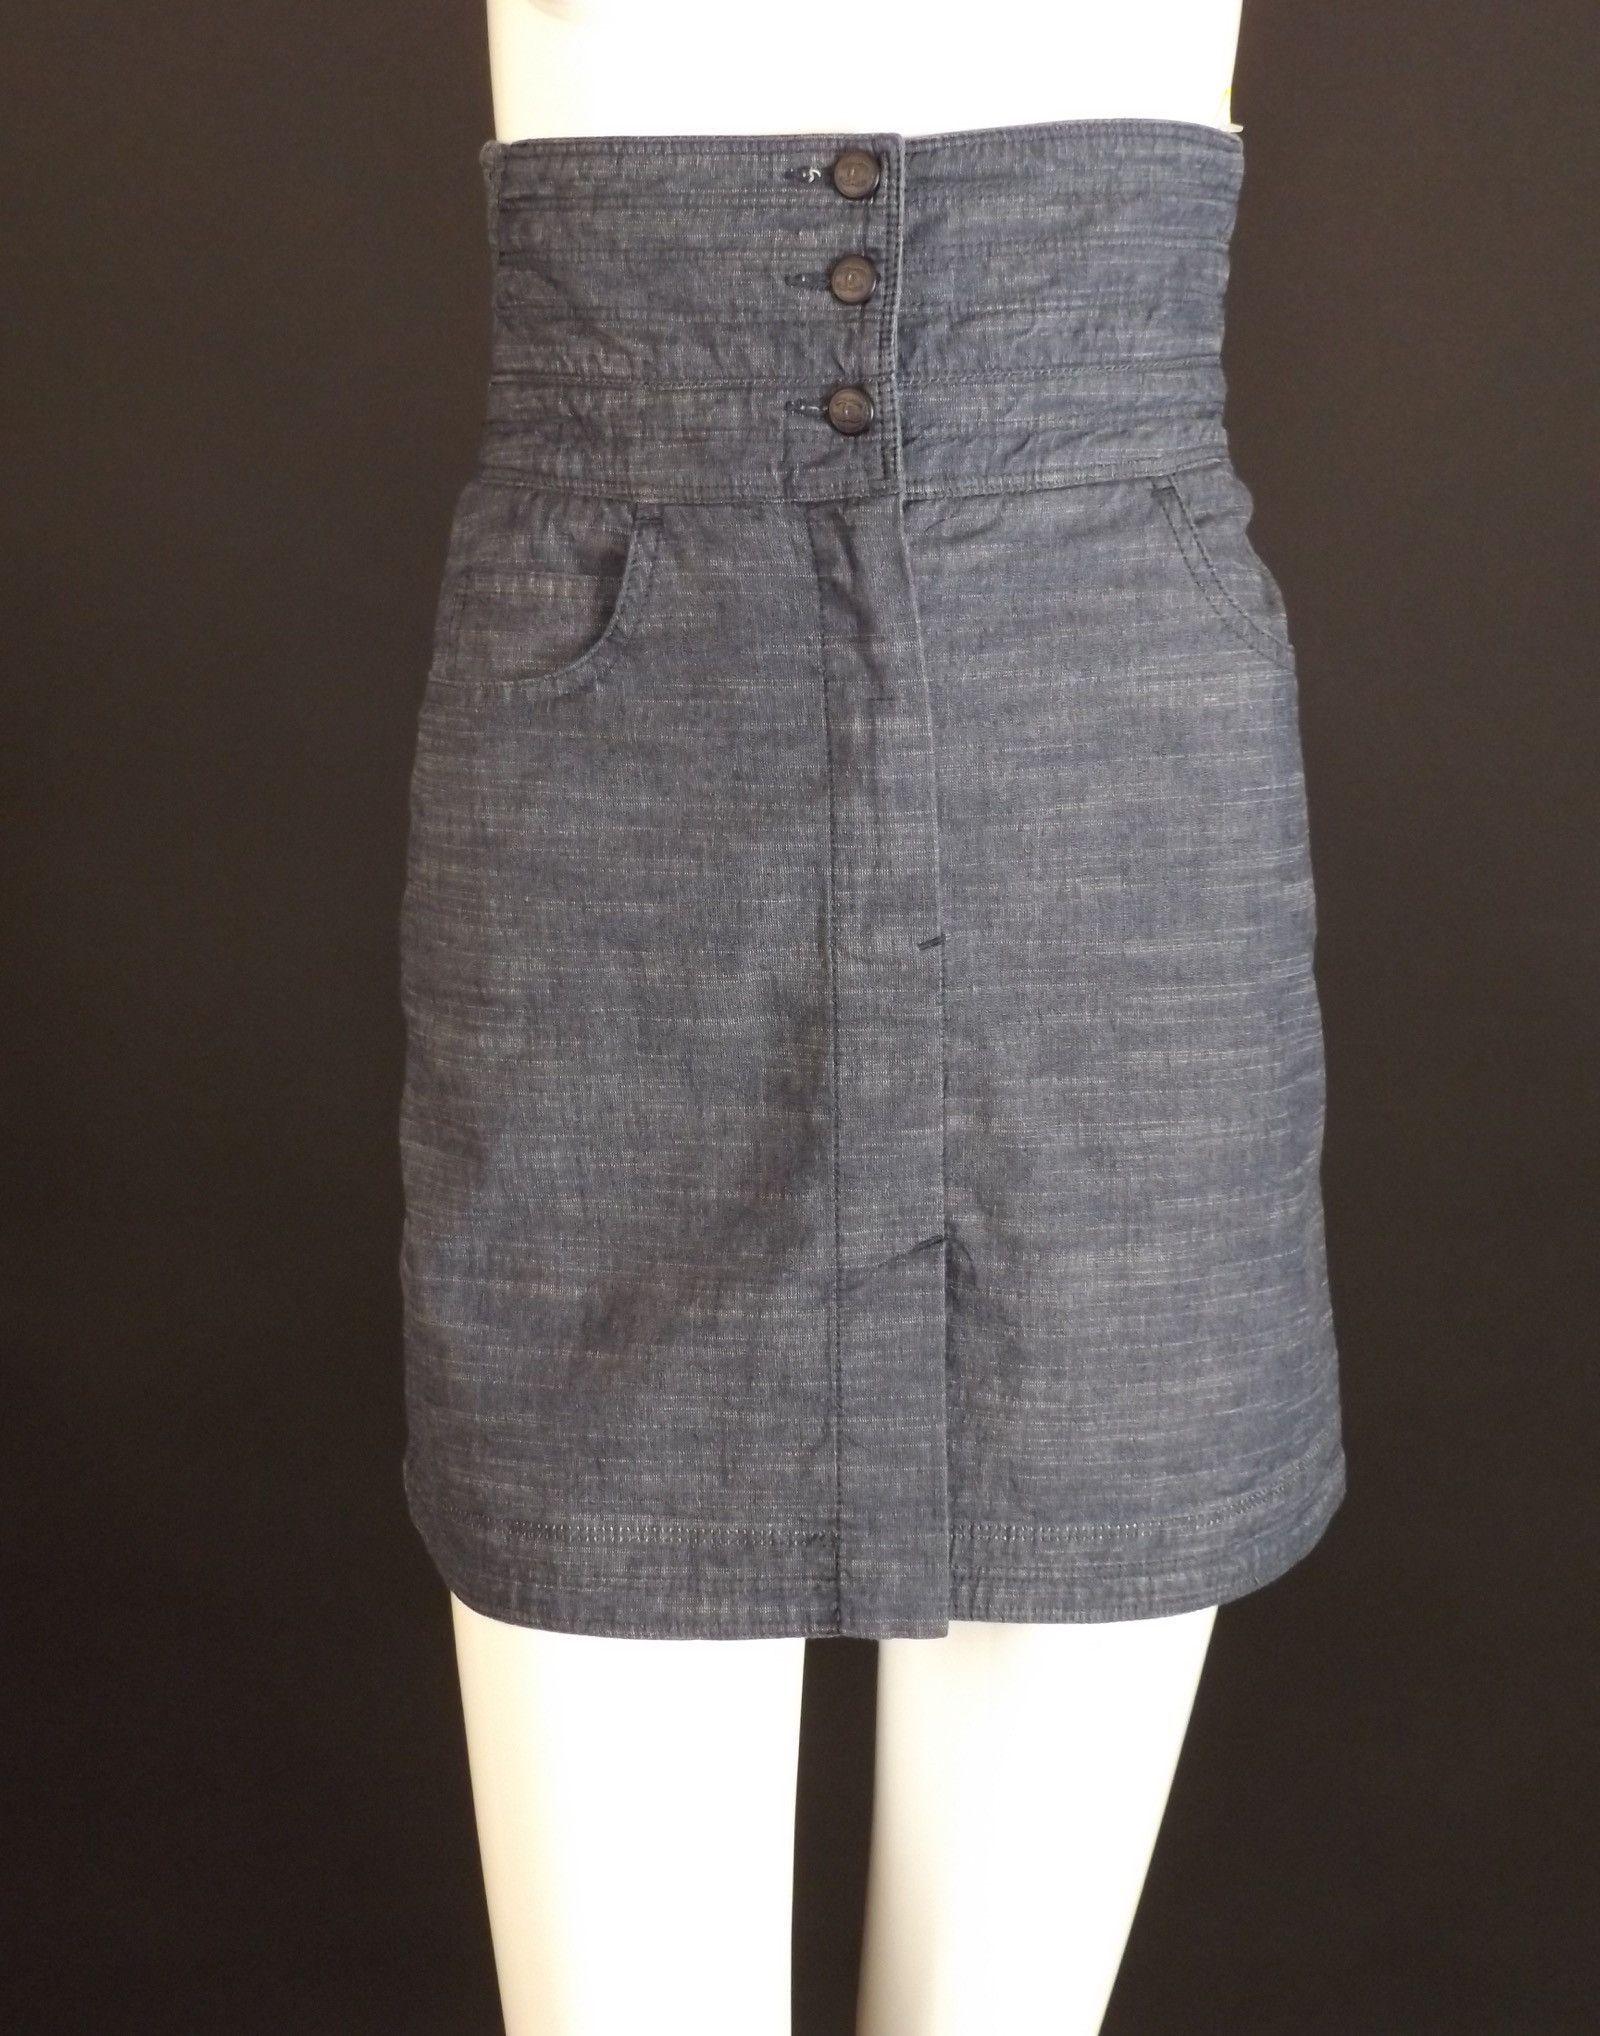 CHANEL-Blue Chambray A-Line Skirt, Waist-28